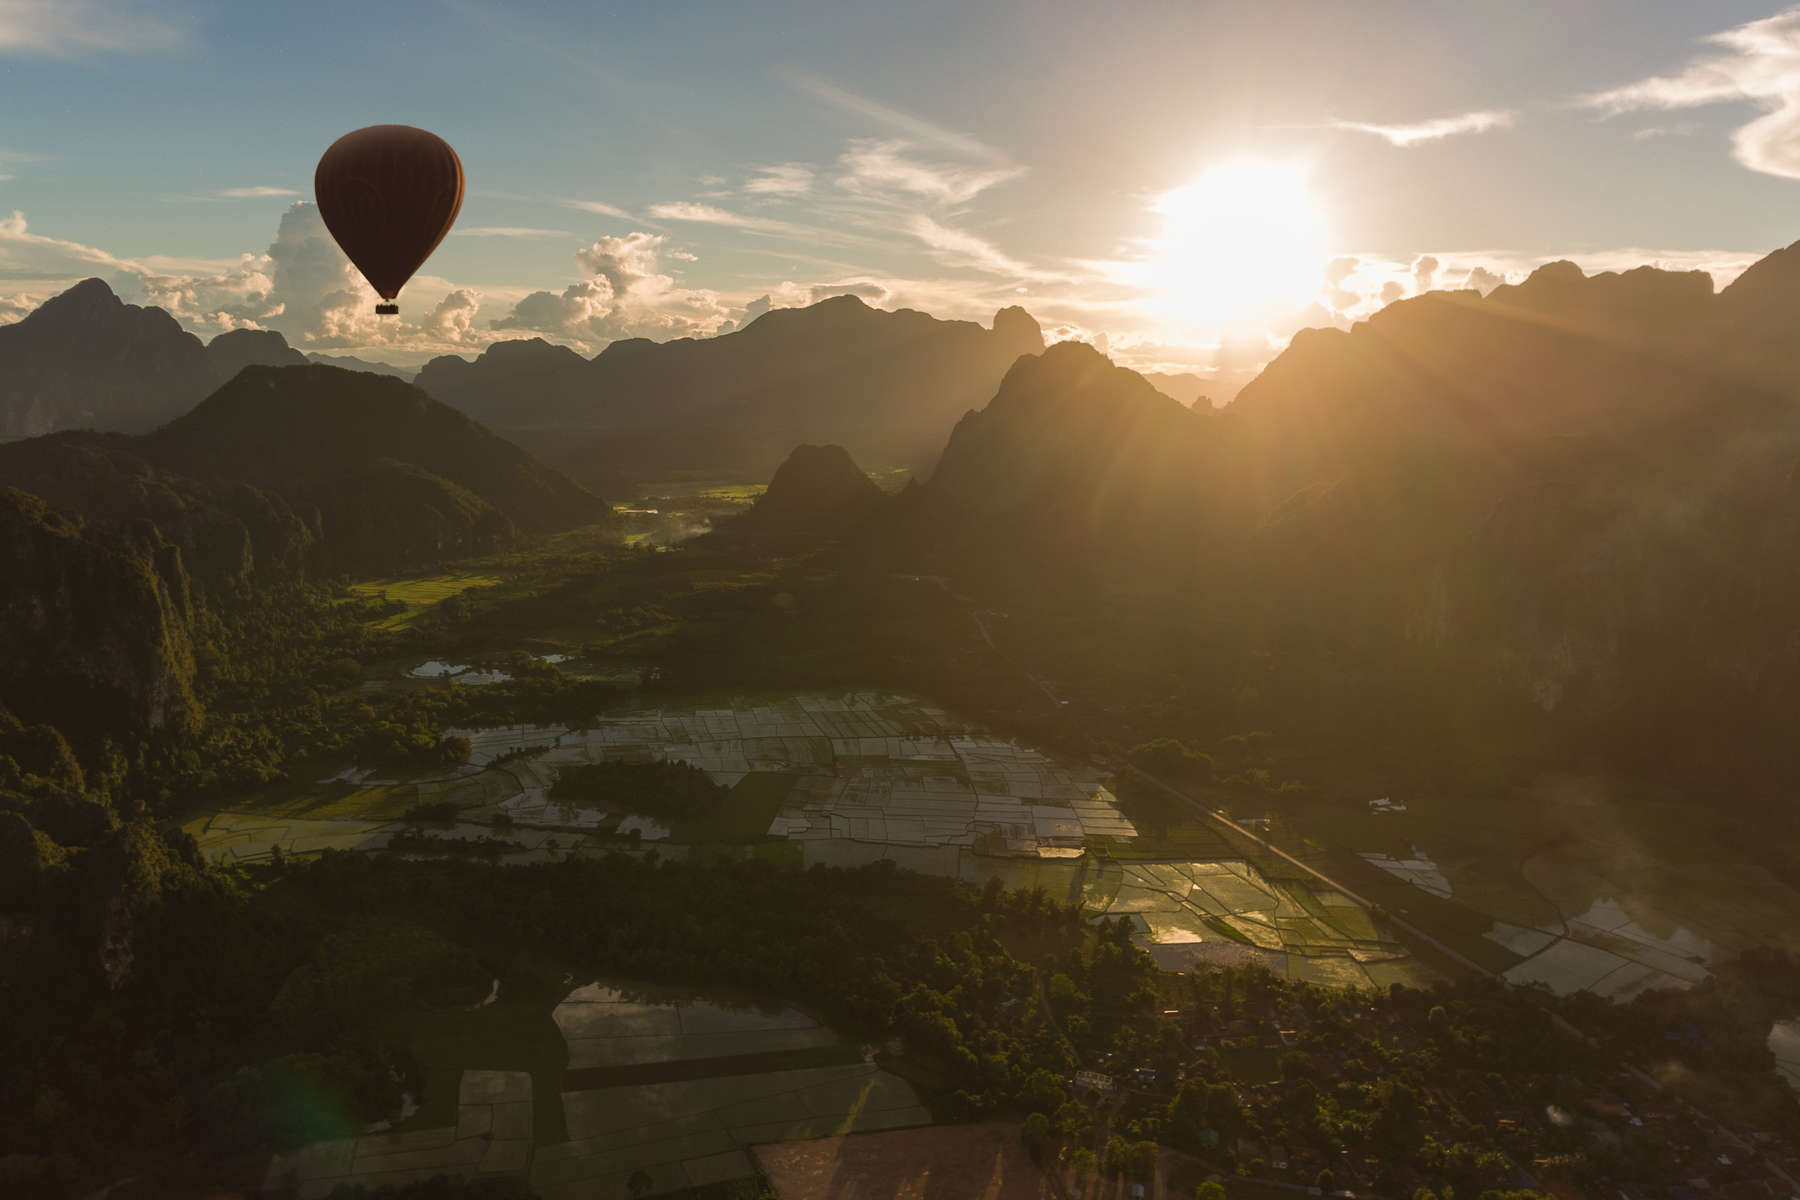 Laos-Vang-Vieng-Balloon-02-landscape-GIZ-photo-by-Cyril-Eberle-DJI_0592